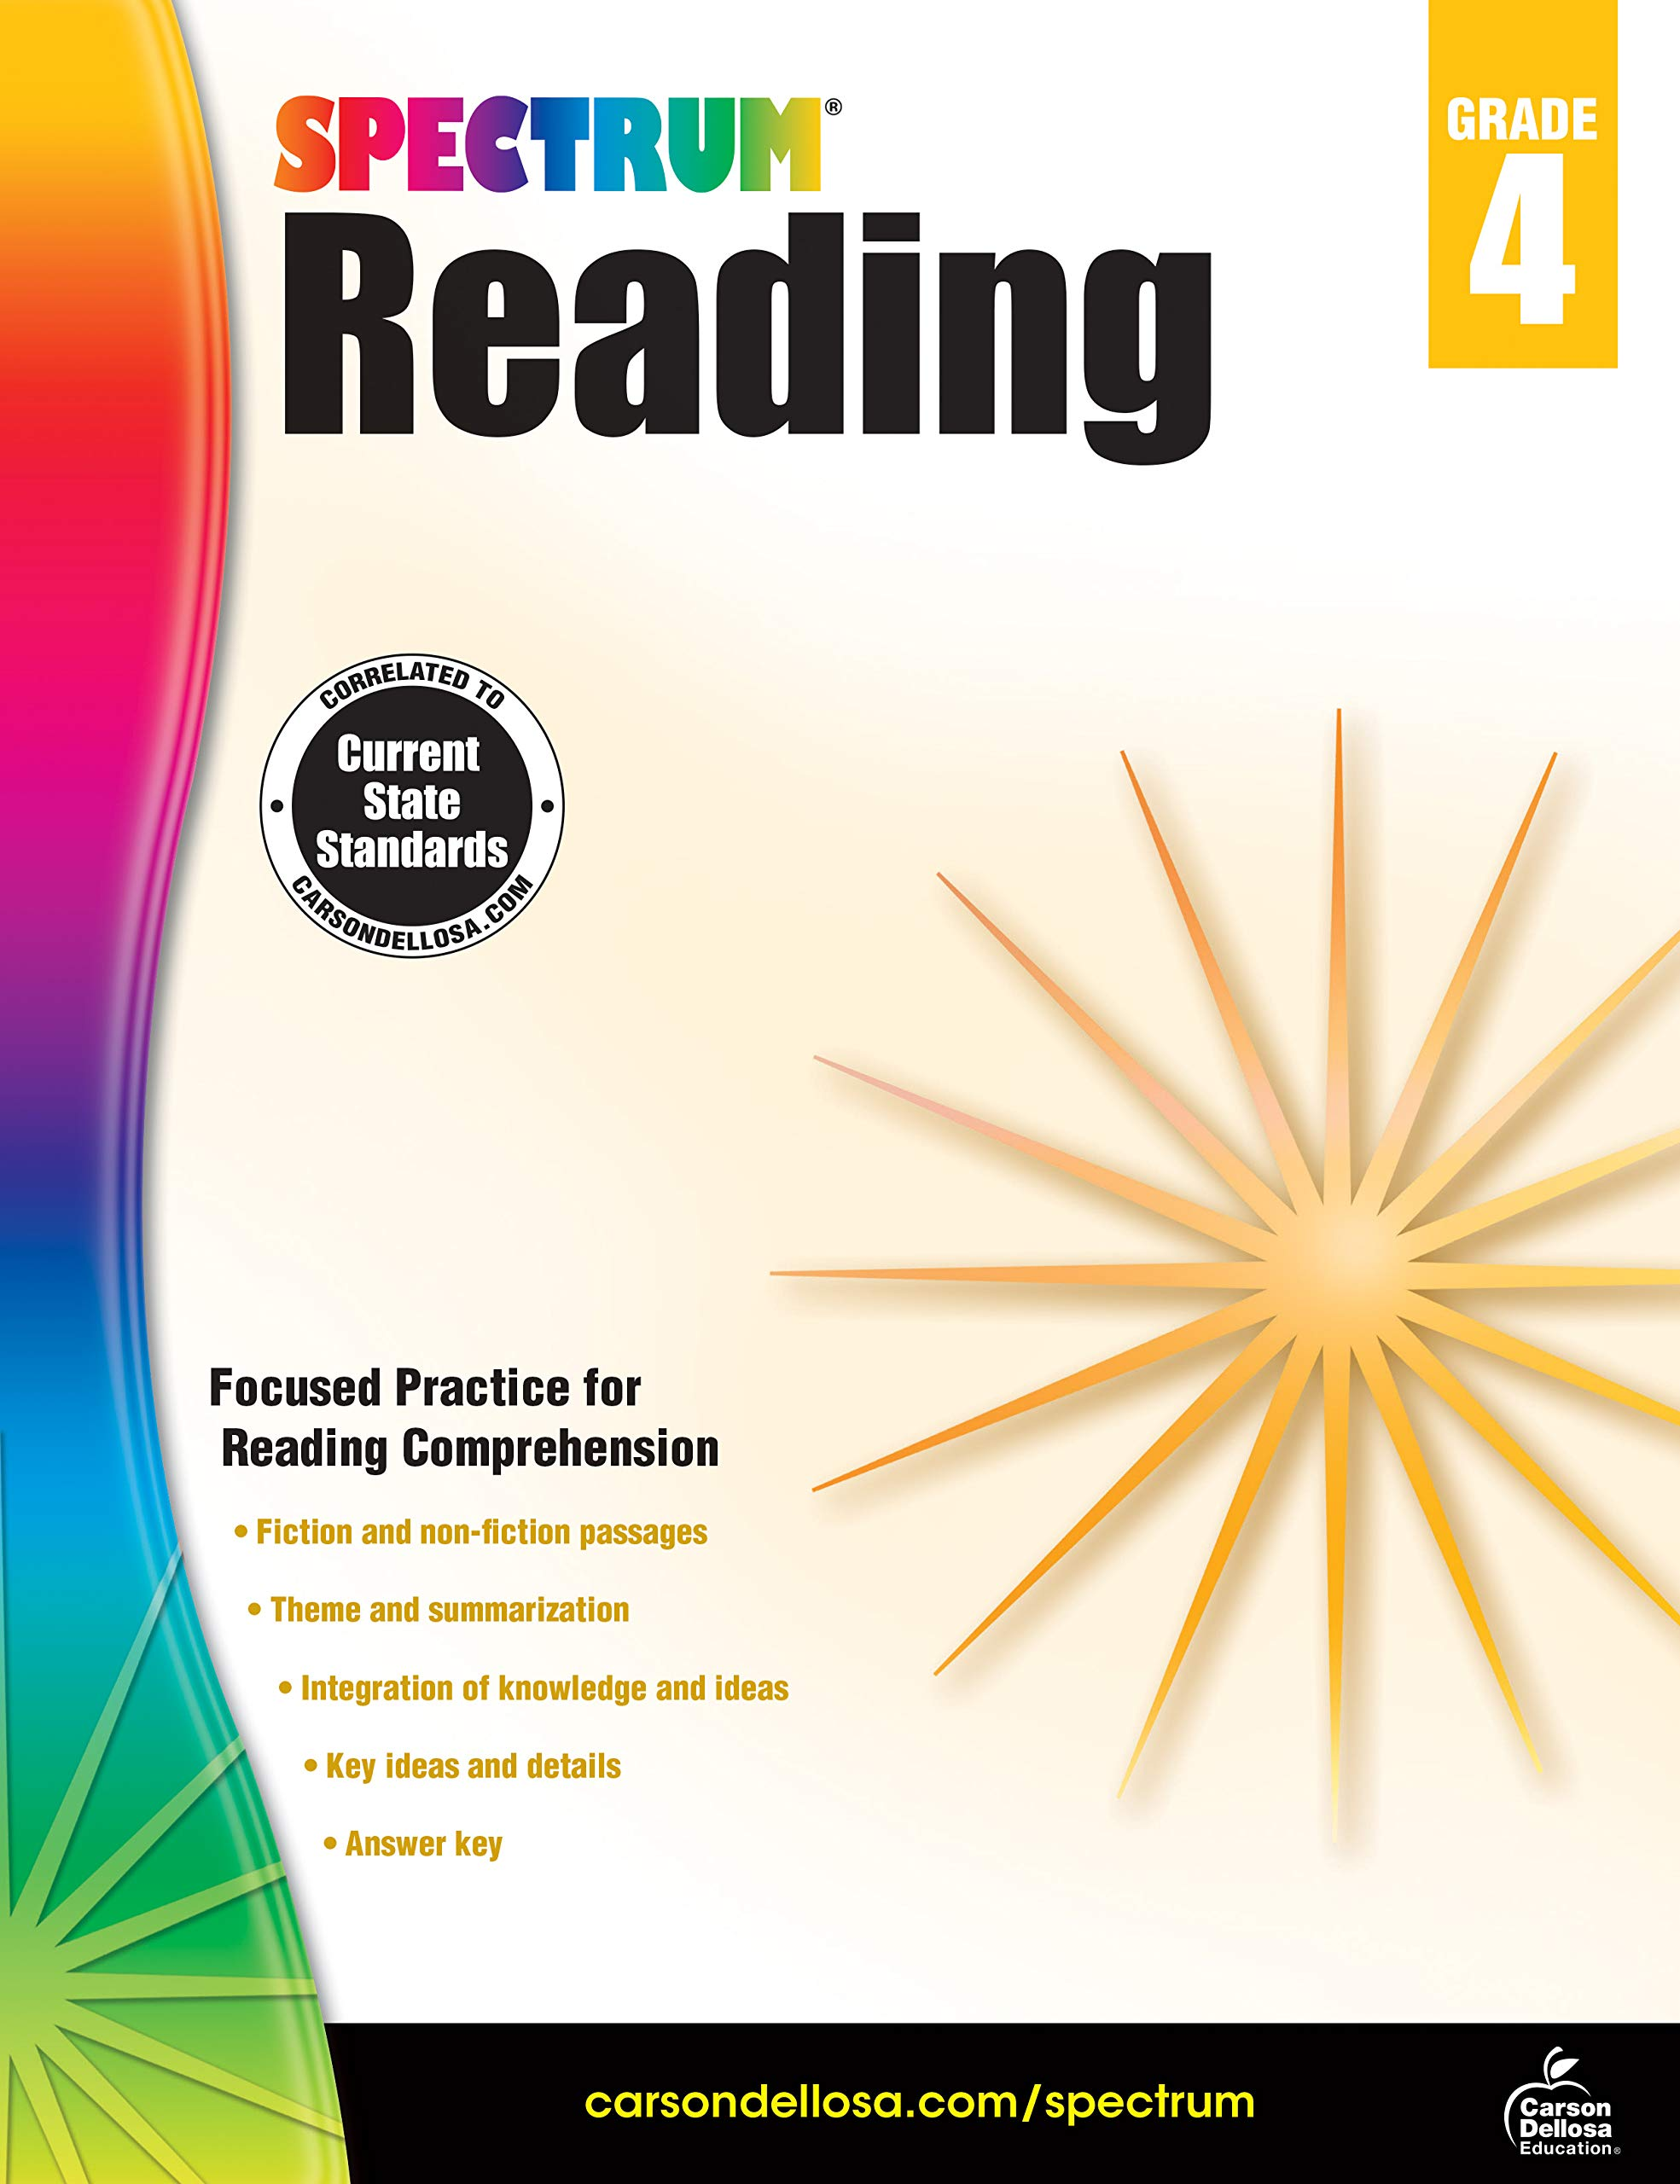 - Spectrum Reading Workbook 4th Grade, 174pgs: Spectrum